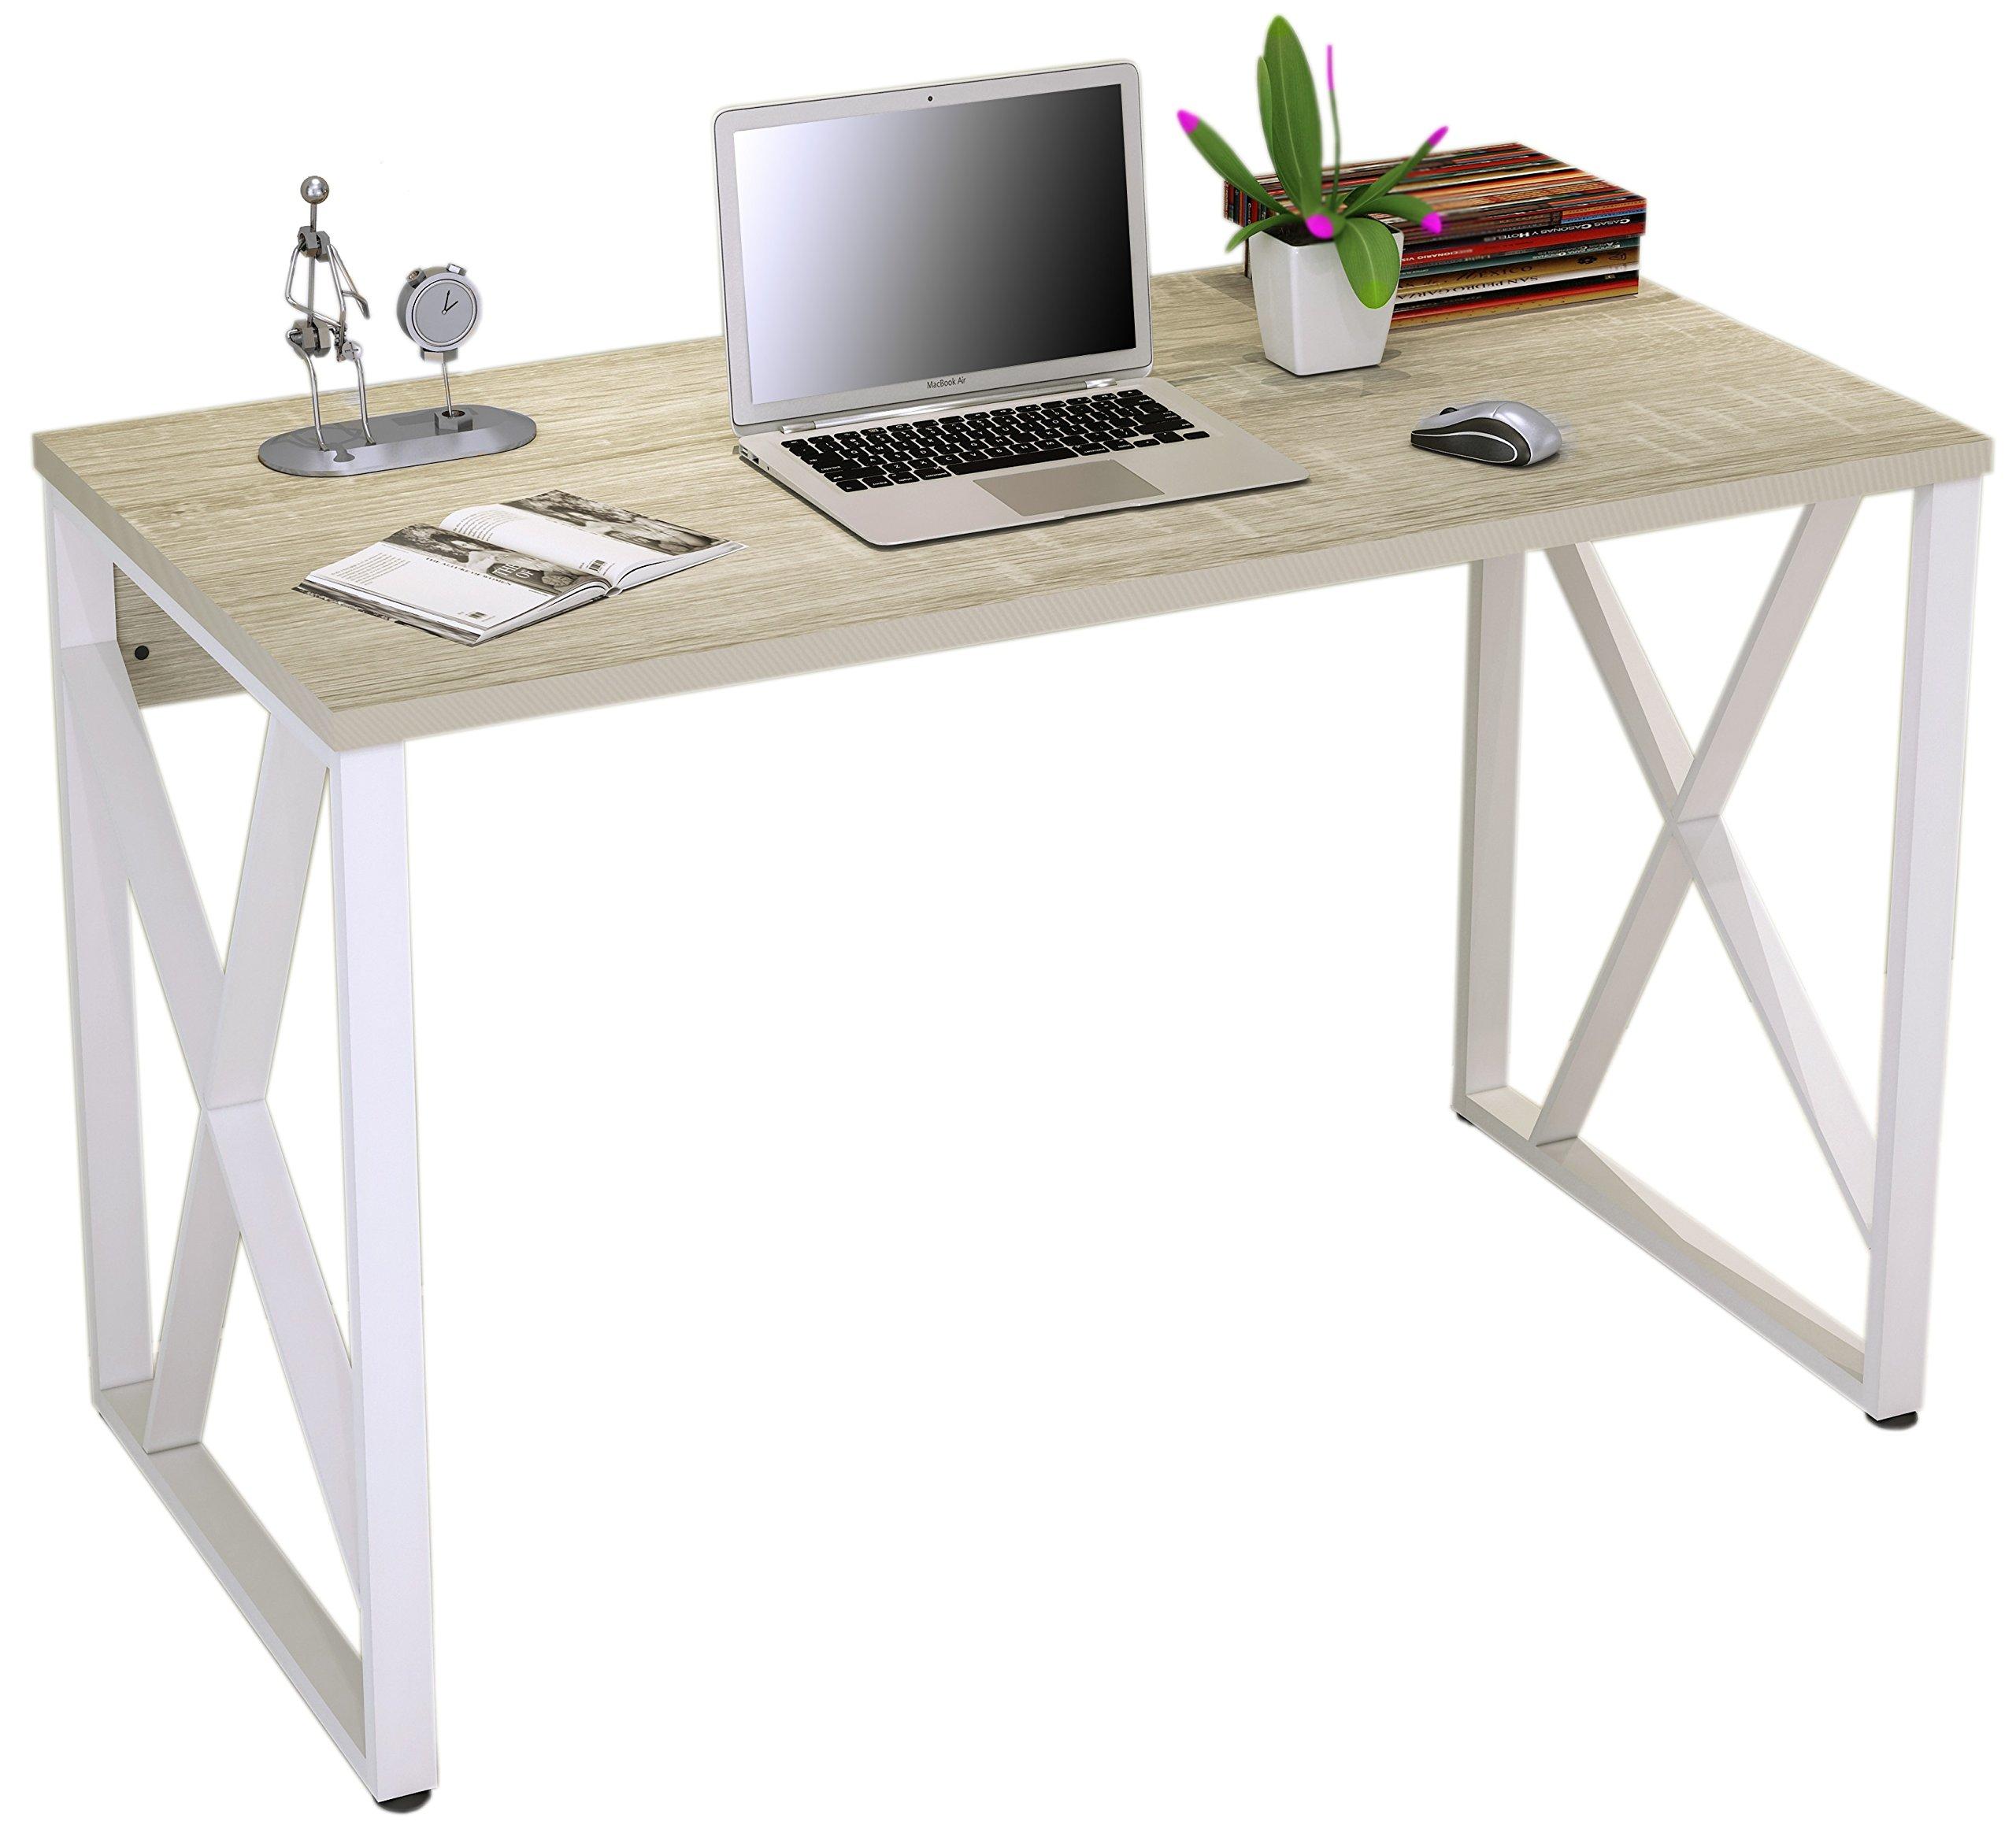 Mesa de ordenador Roble/Blanco Óptica madera S-349/1851 product